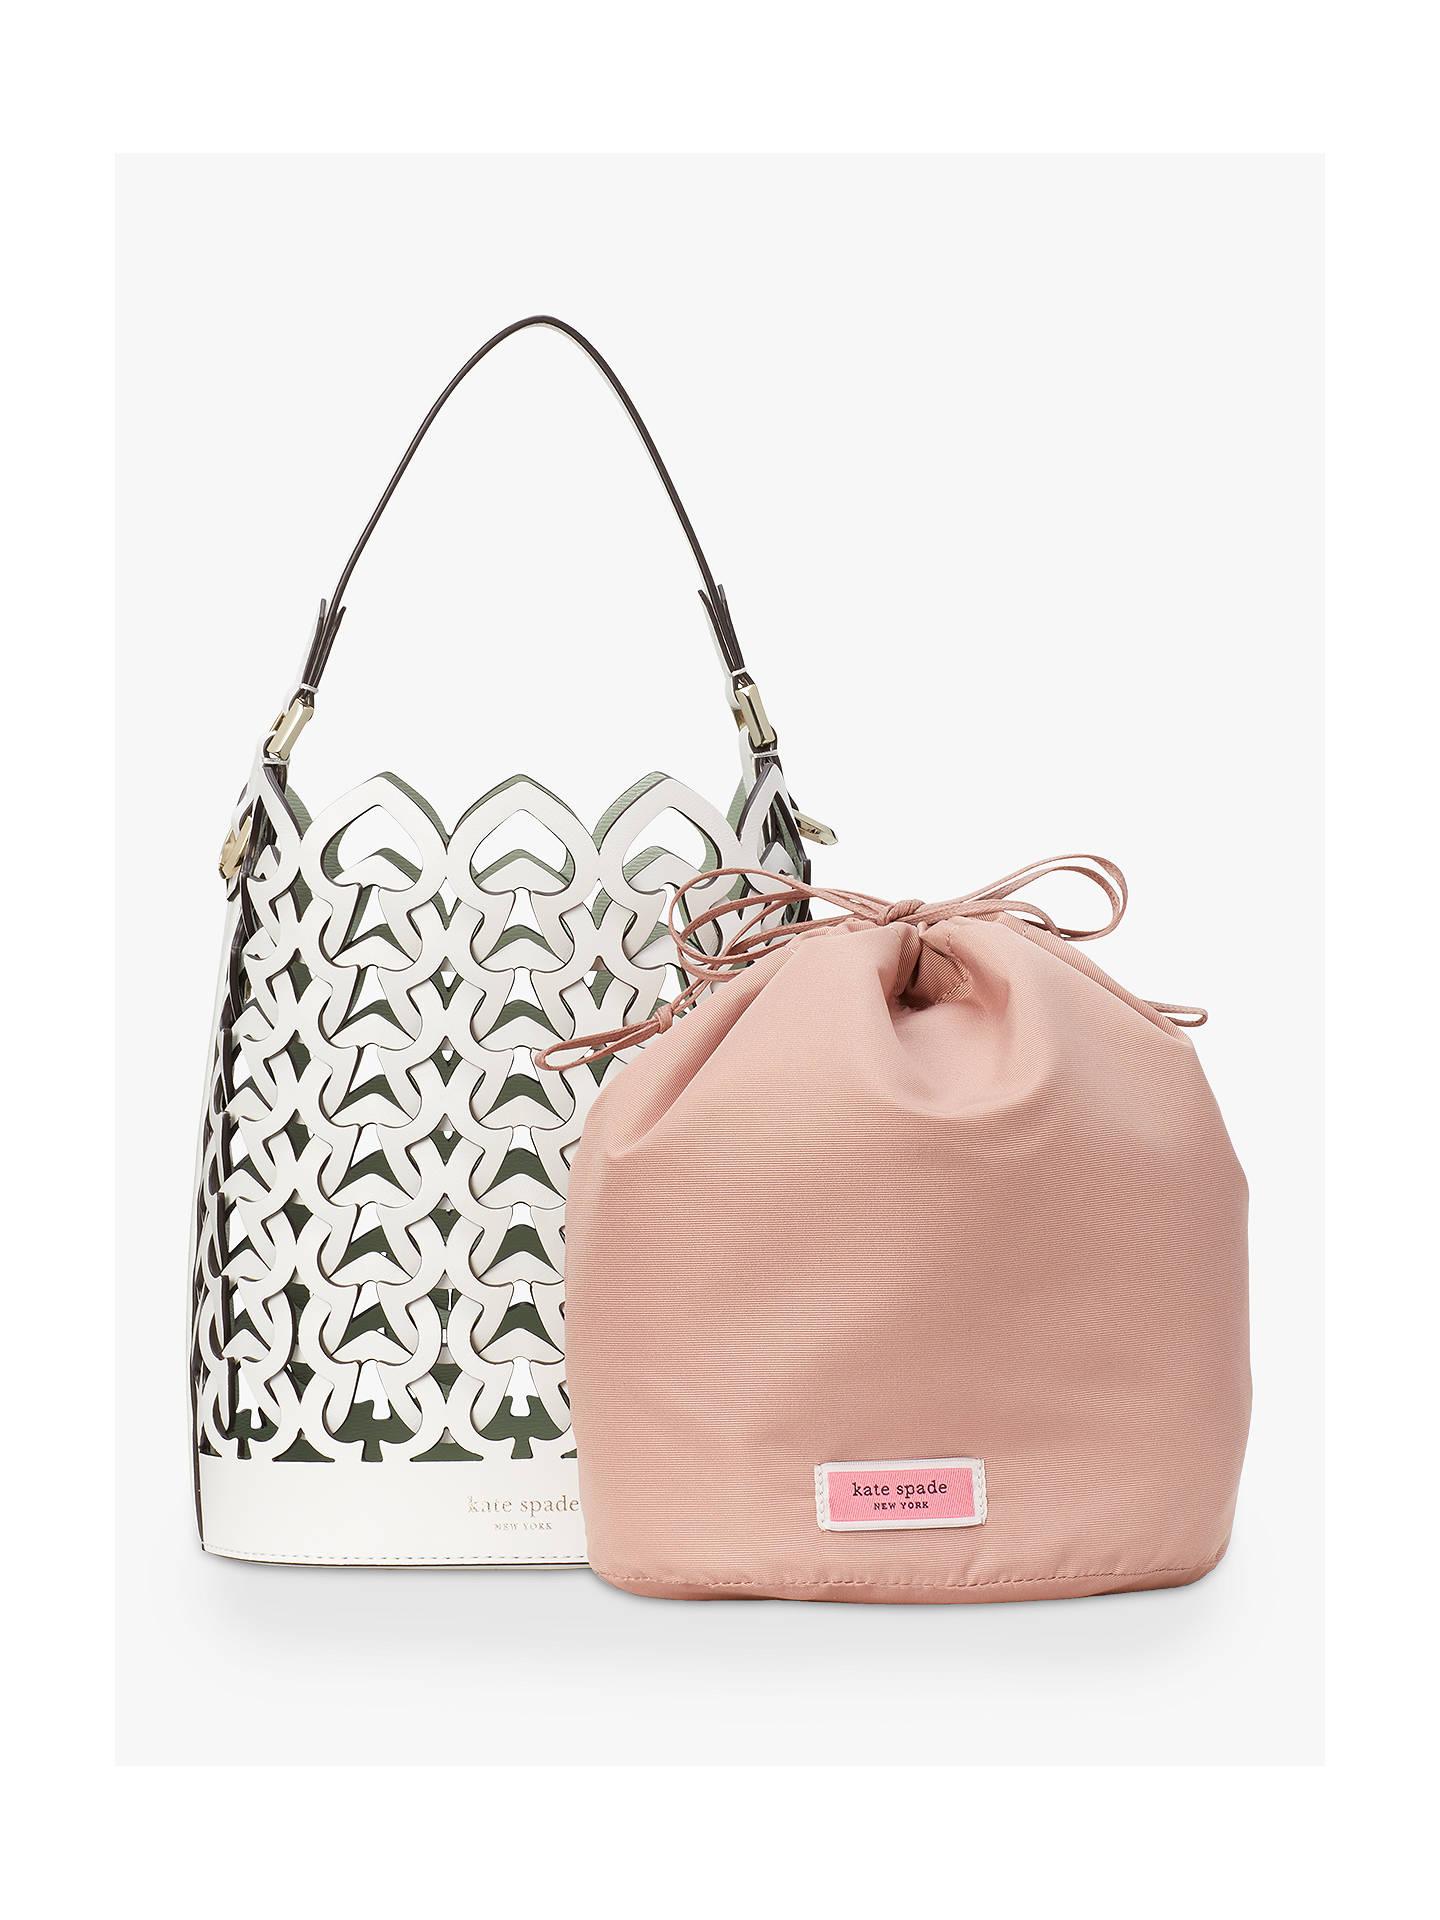 5e3d9d99b2e kate spade new york Dorie Leather Small Bucket Bag, White